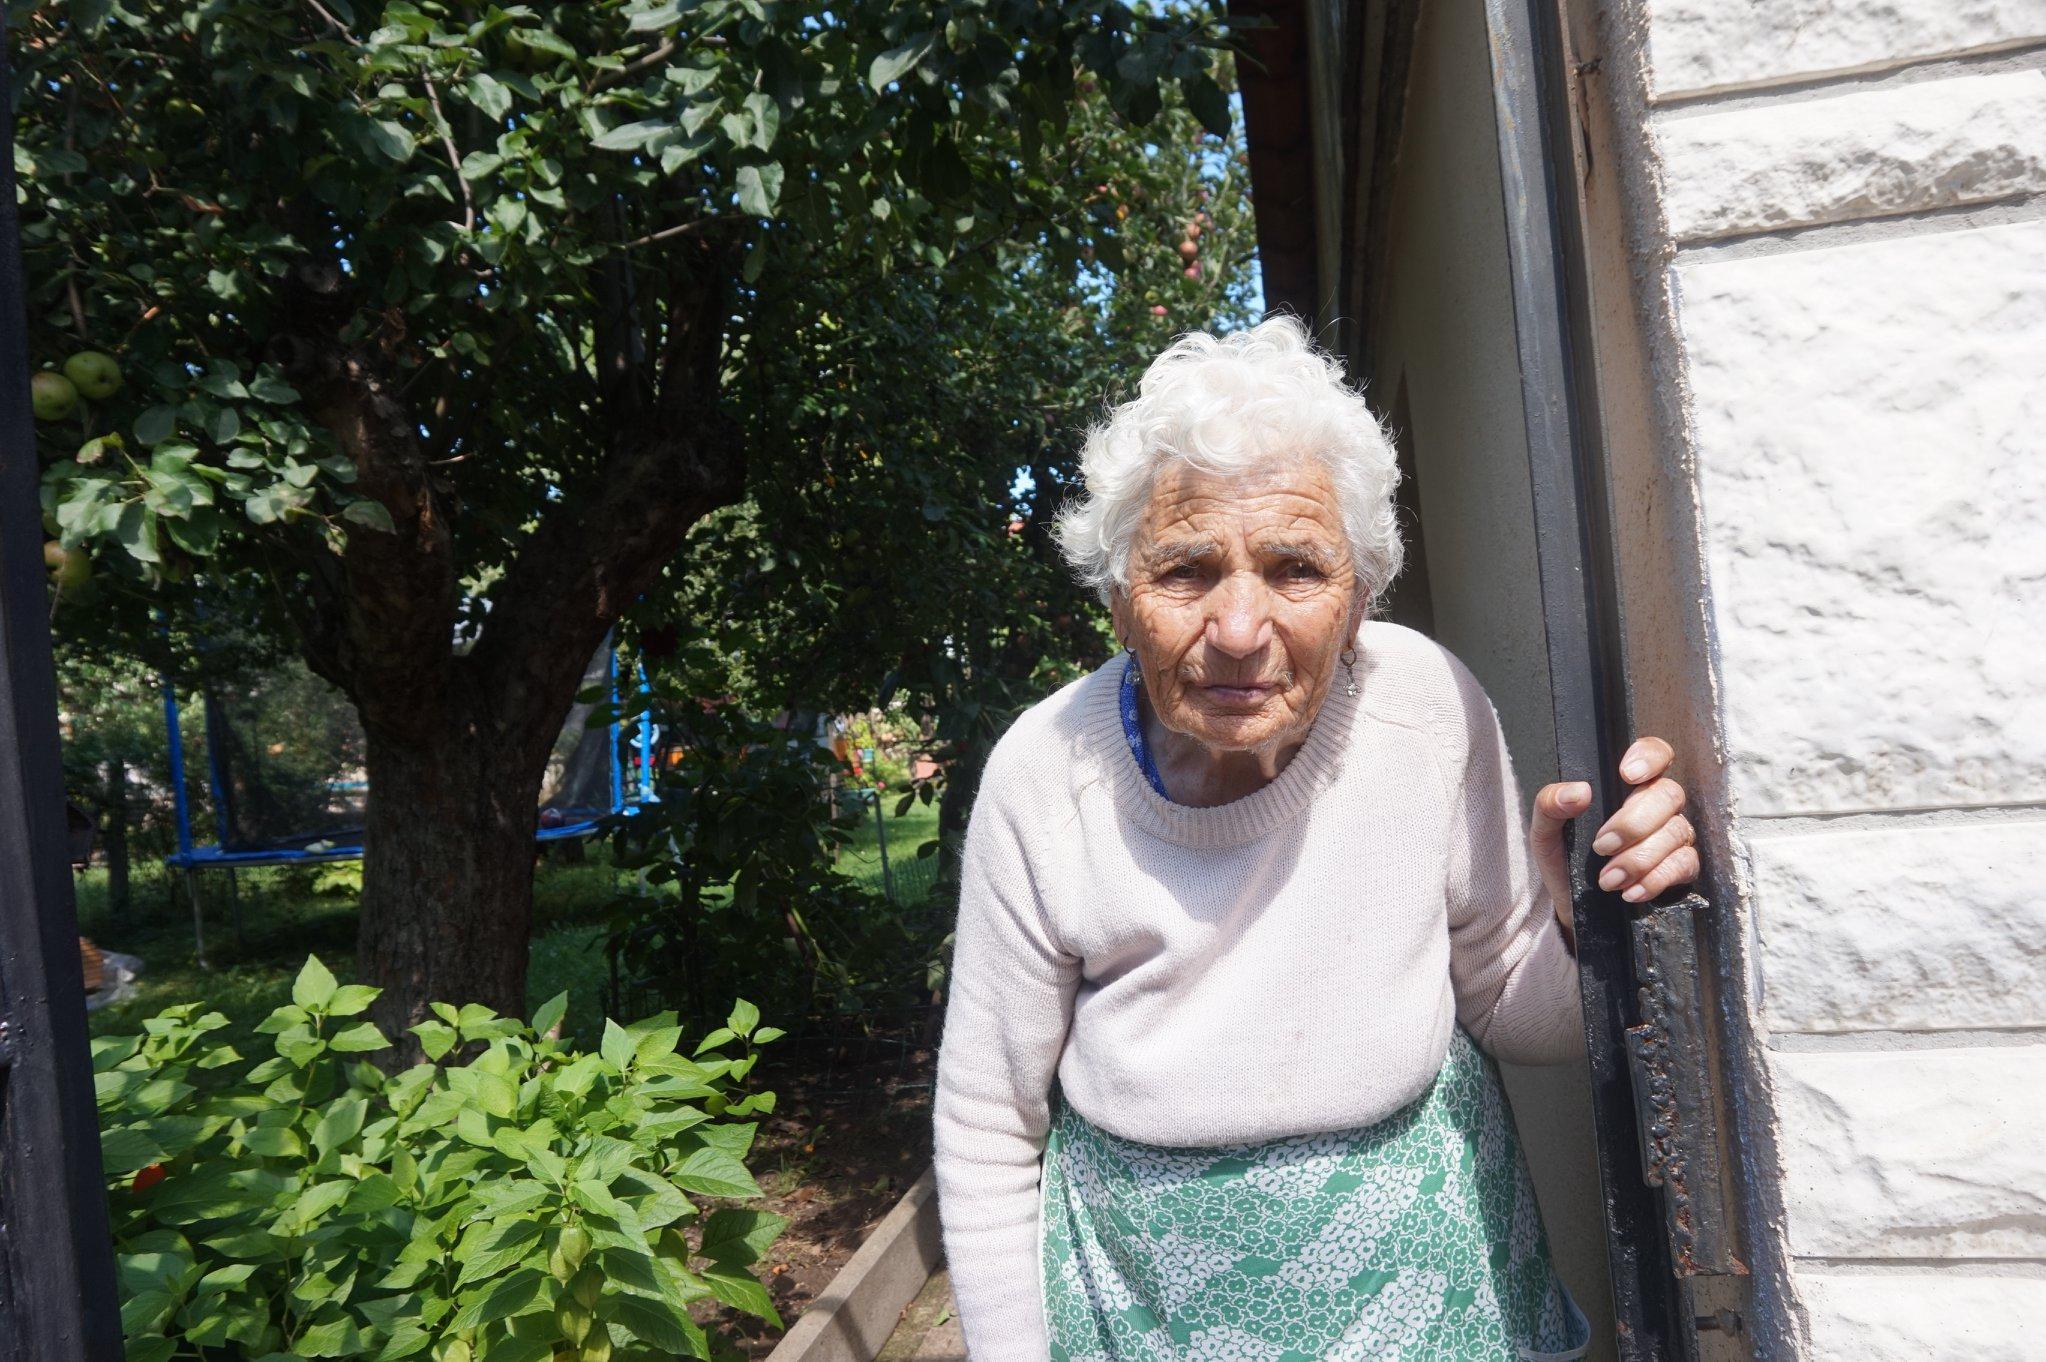 Добротворци: На 94 г. Богдана плете терлици и ги дарява на децата по улицат